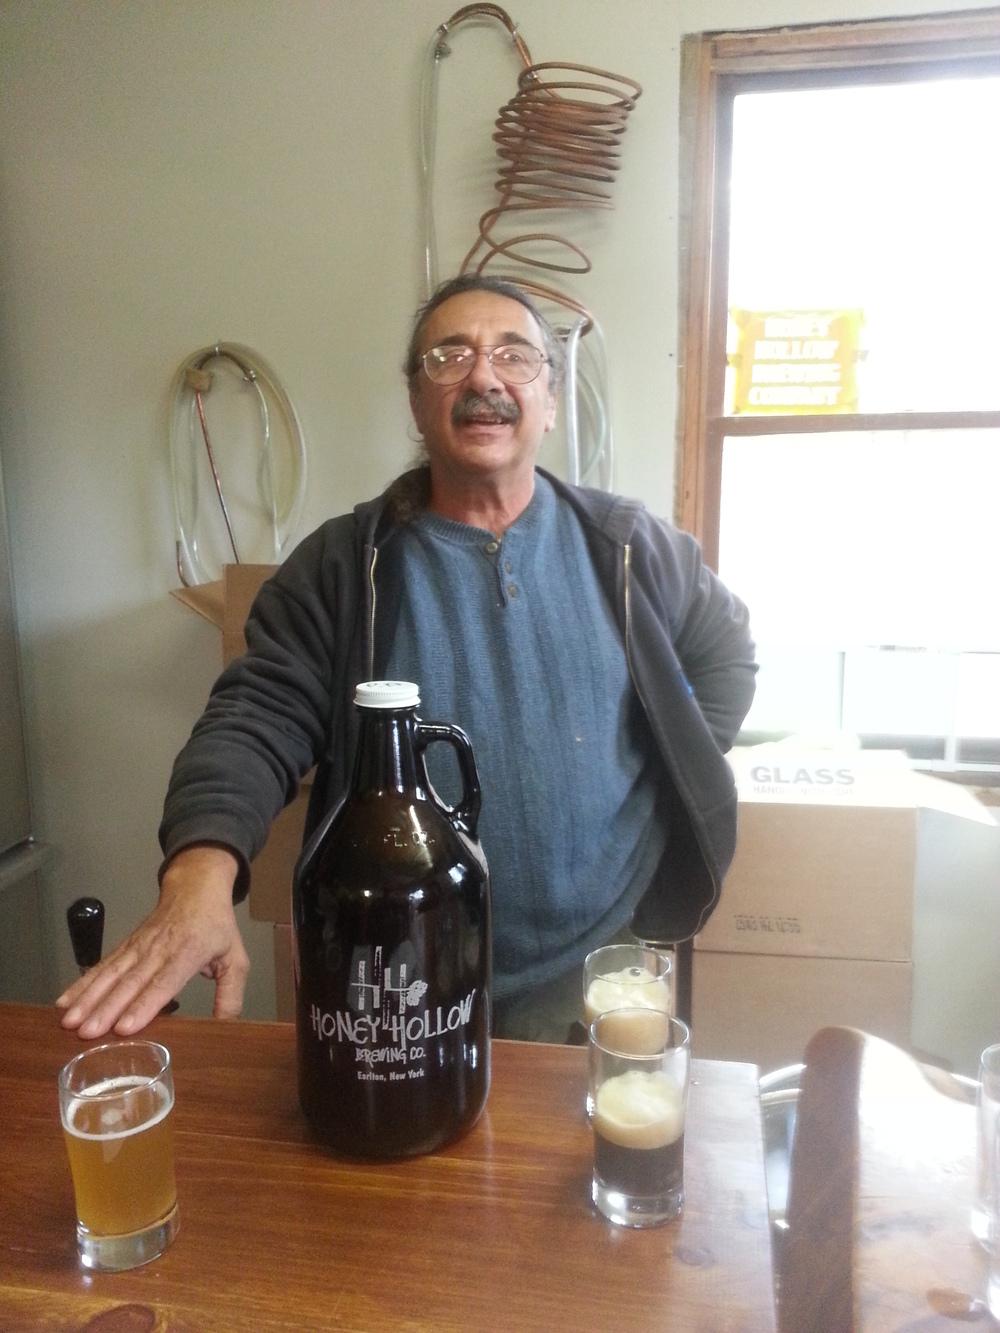 The proprietor and kindly barkeep, Matty Taormina.